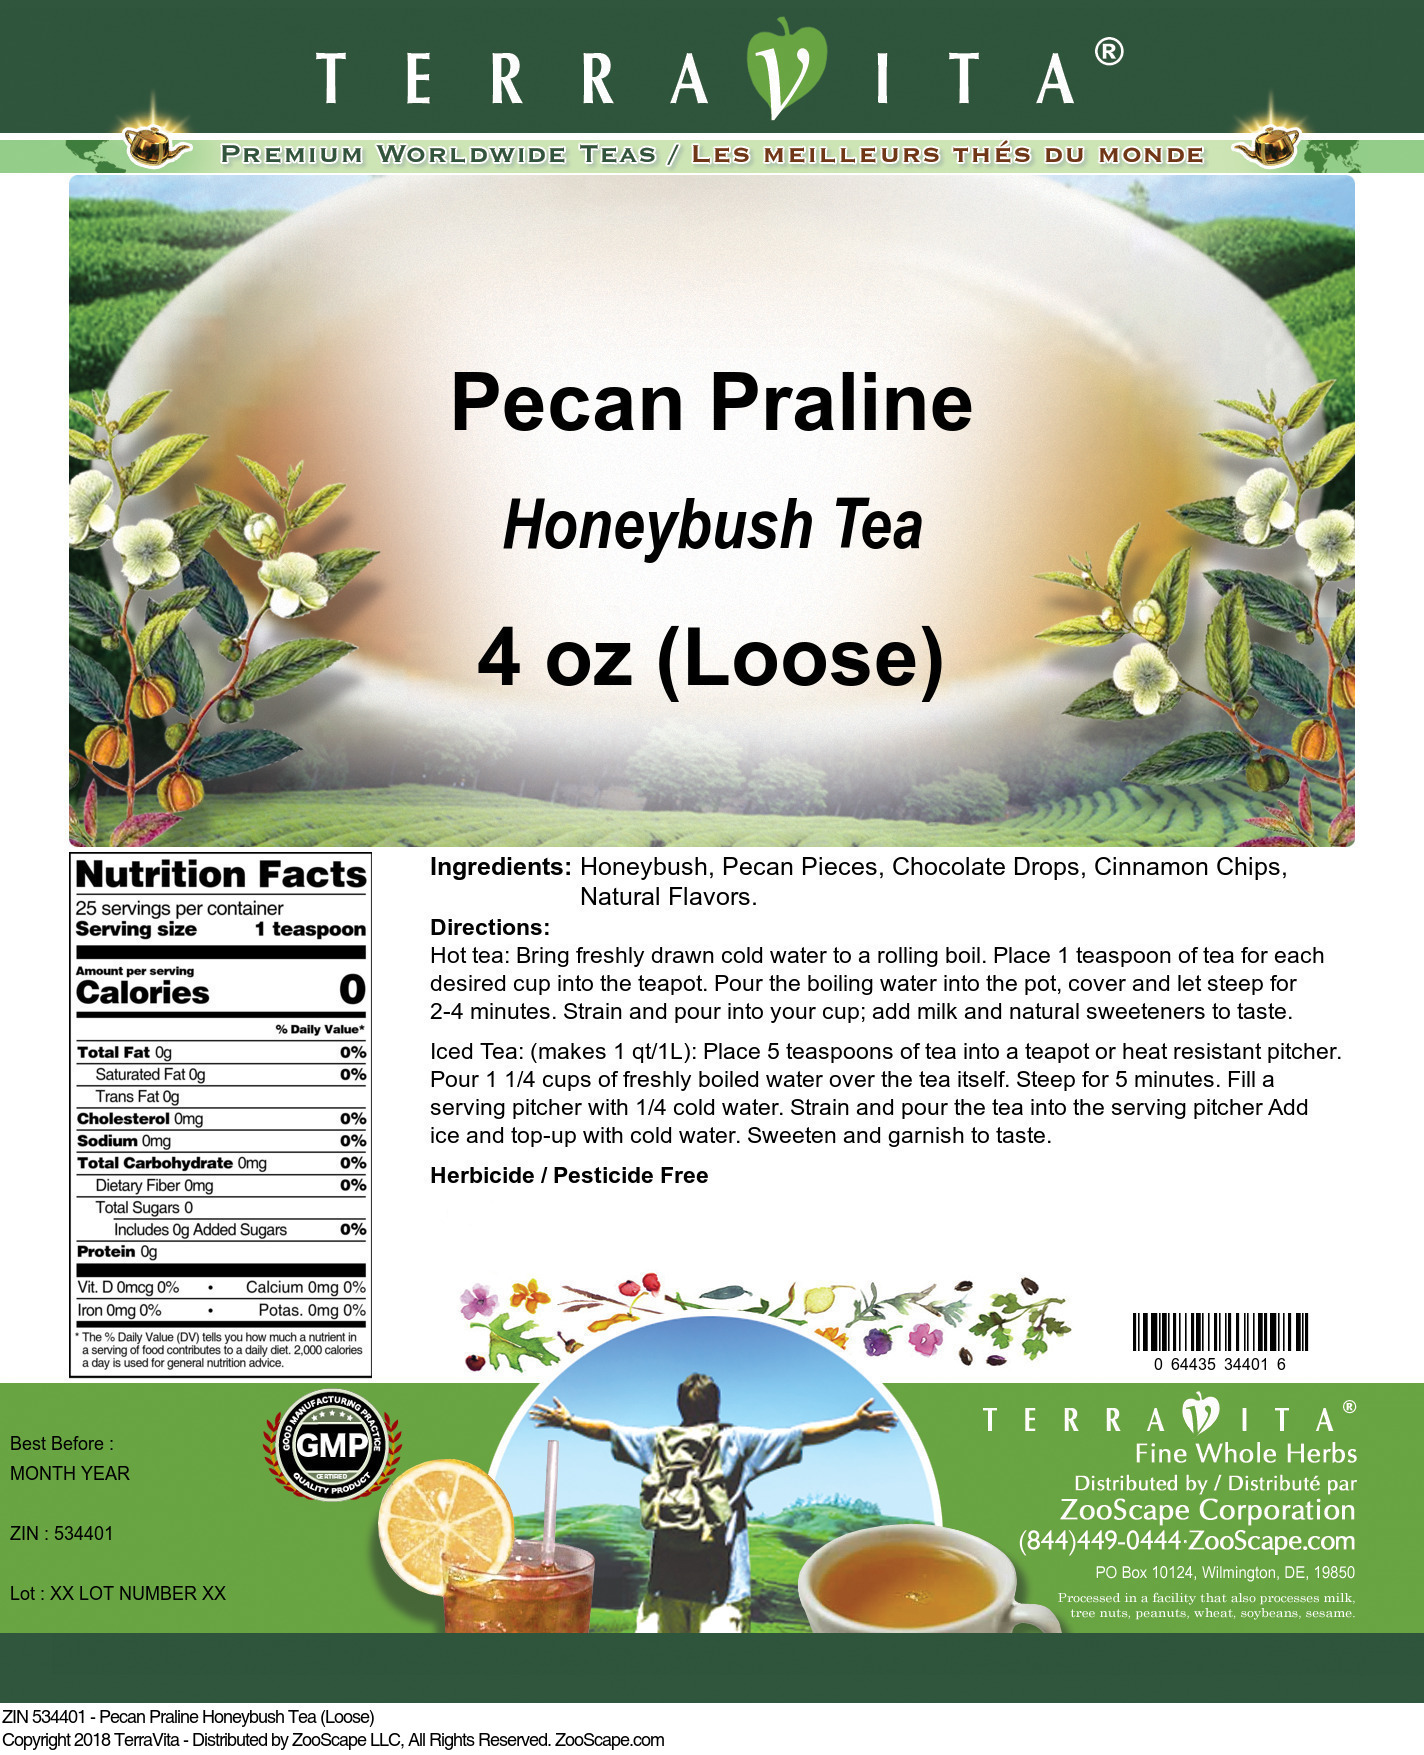 Pecan Praline Honeybush Tea (Loose)